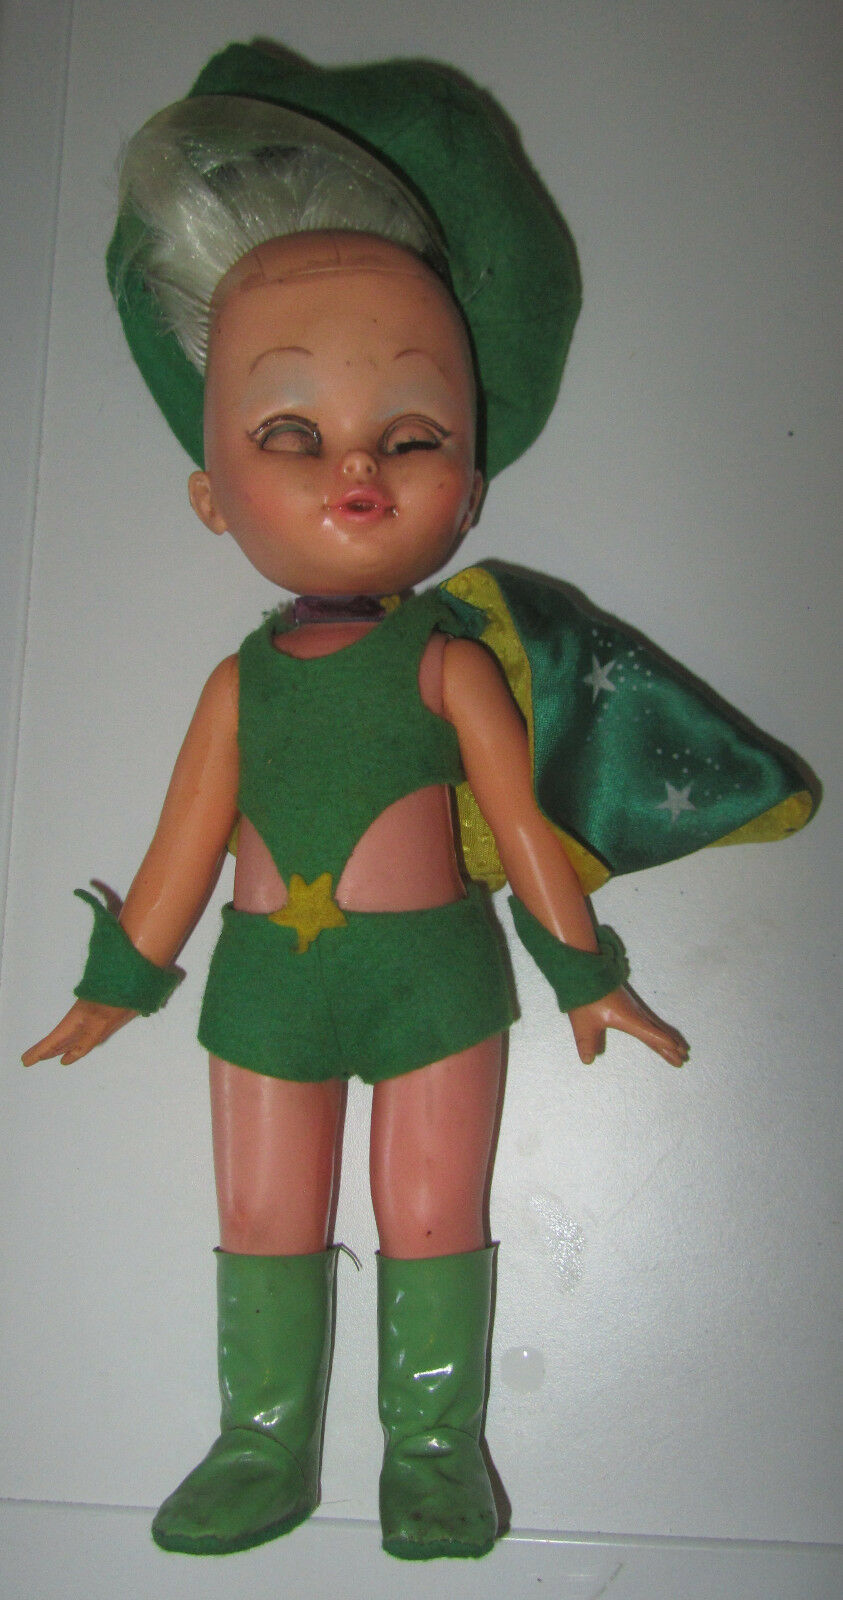 Maga Maghella RARA VARIANTE verde Franca Raffaella autorà 30cm  SPESE GRATIS  presa di fabbrica